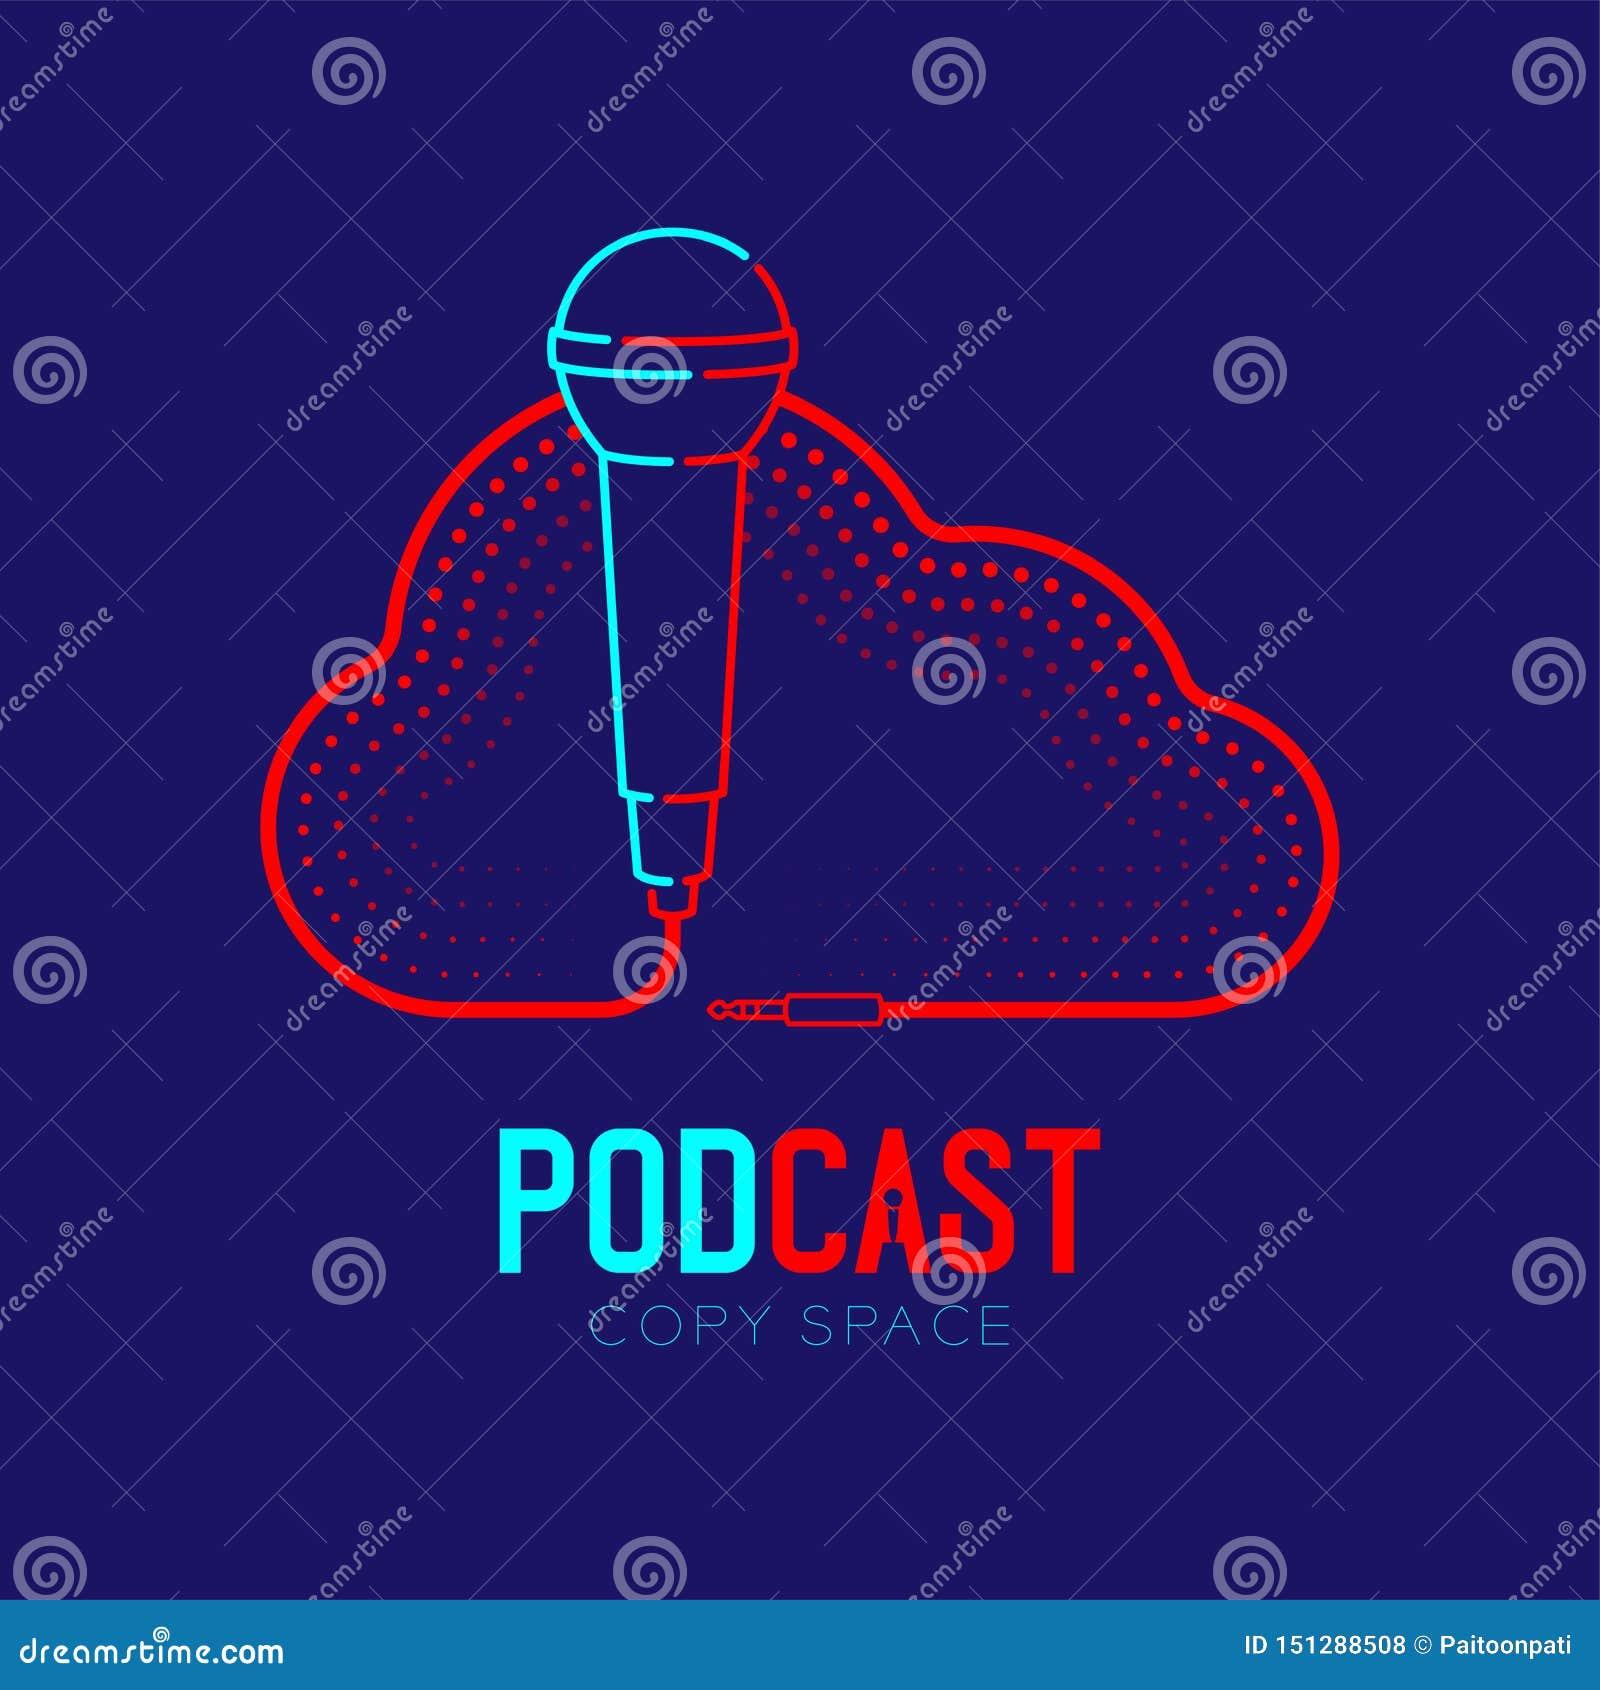 Microphone logo icon outline stroke with Cloud shape frame cable dash line design, podcast internet radio program concept